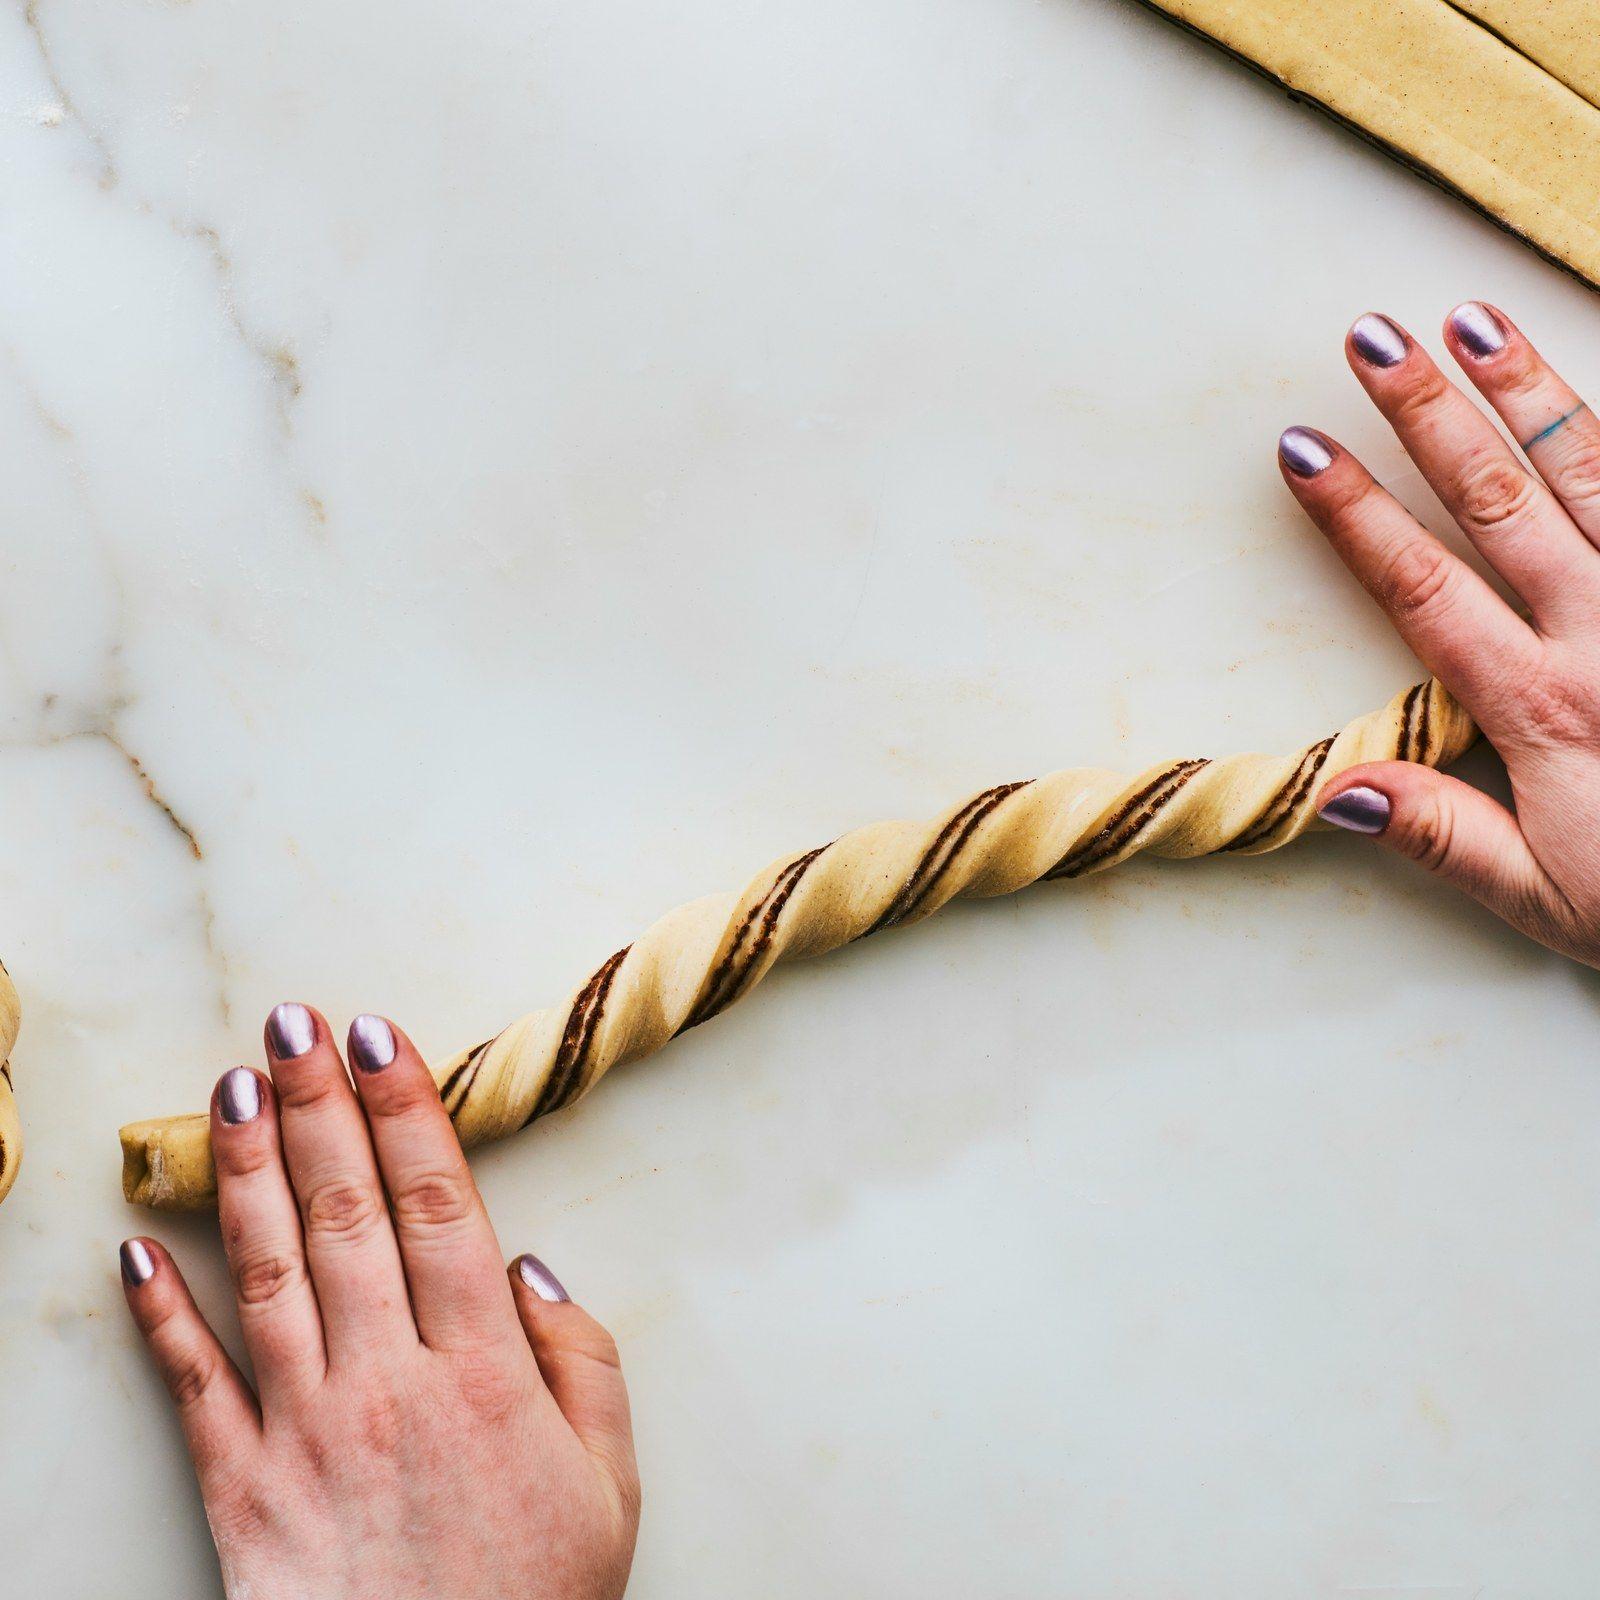 How to Make and Shape Our Glazed Cinnamon-Cardamom Buns #cardamombuns